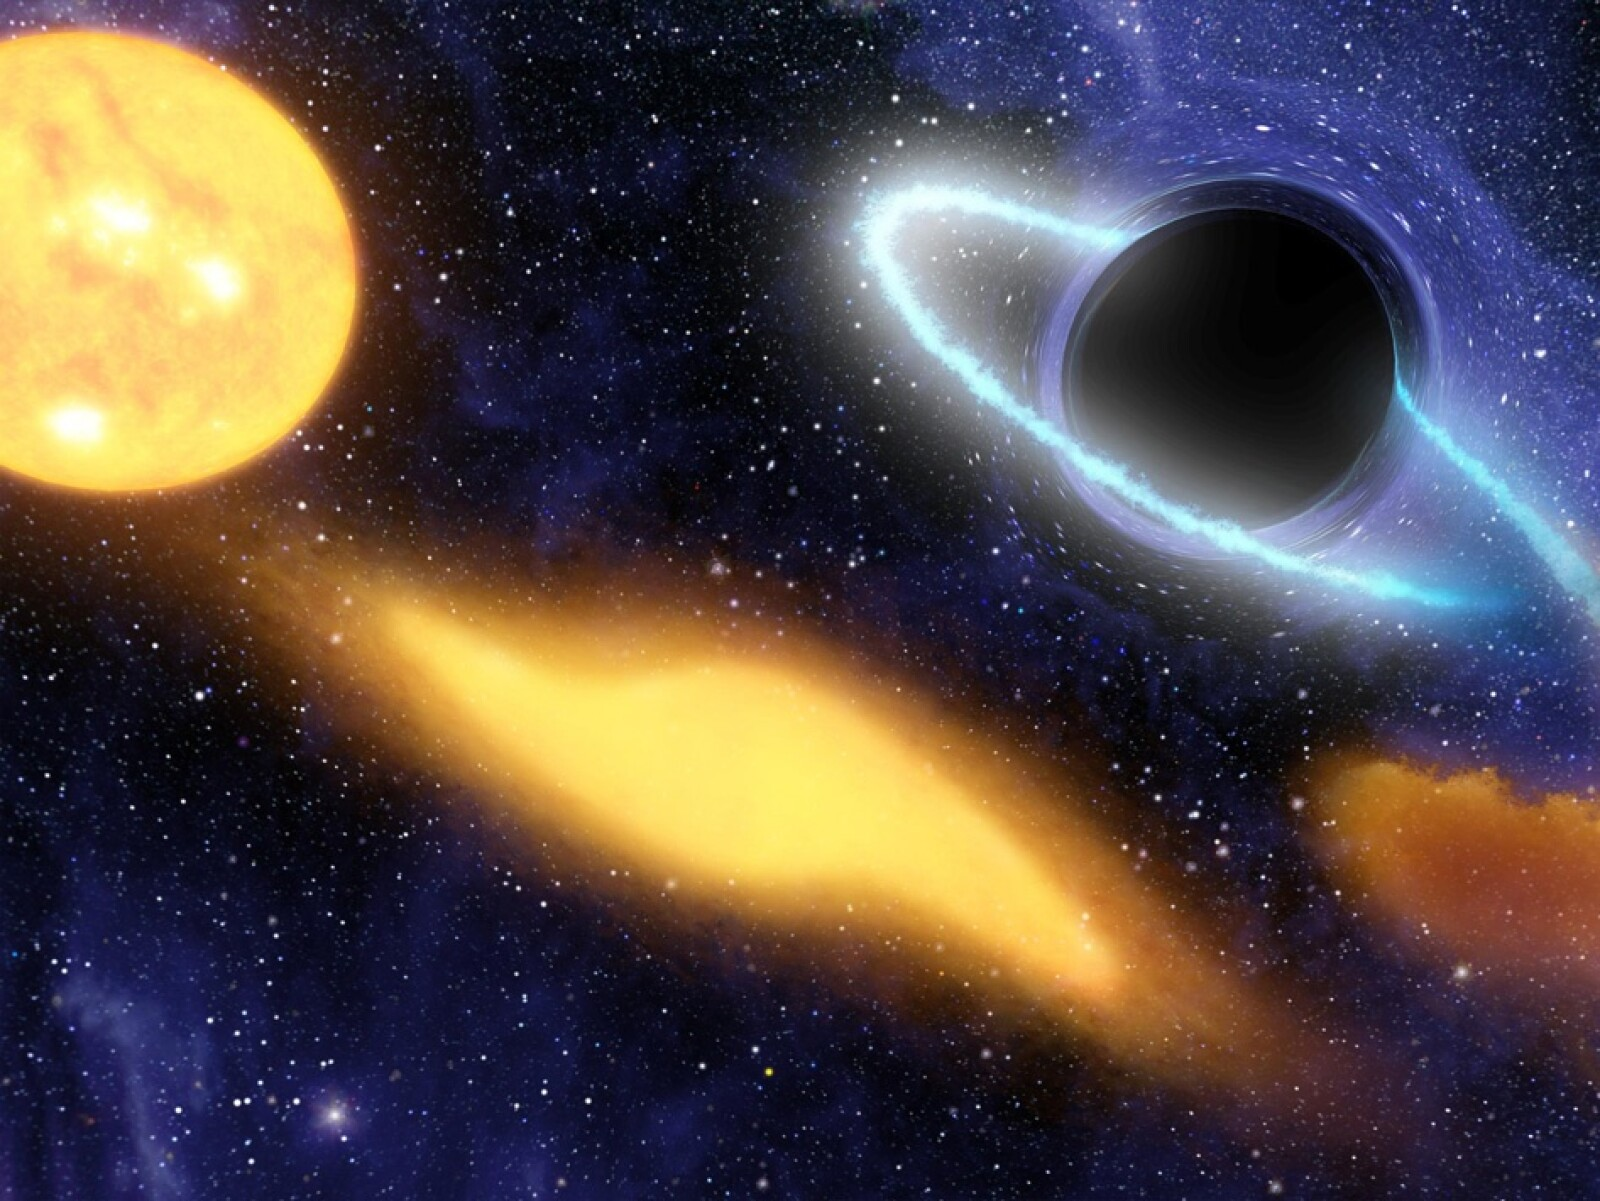 hoyo agujero negro estrella